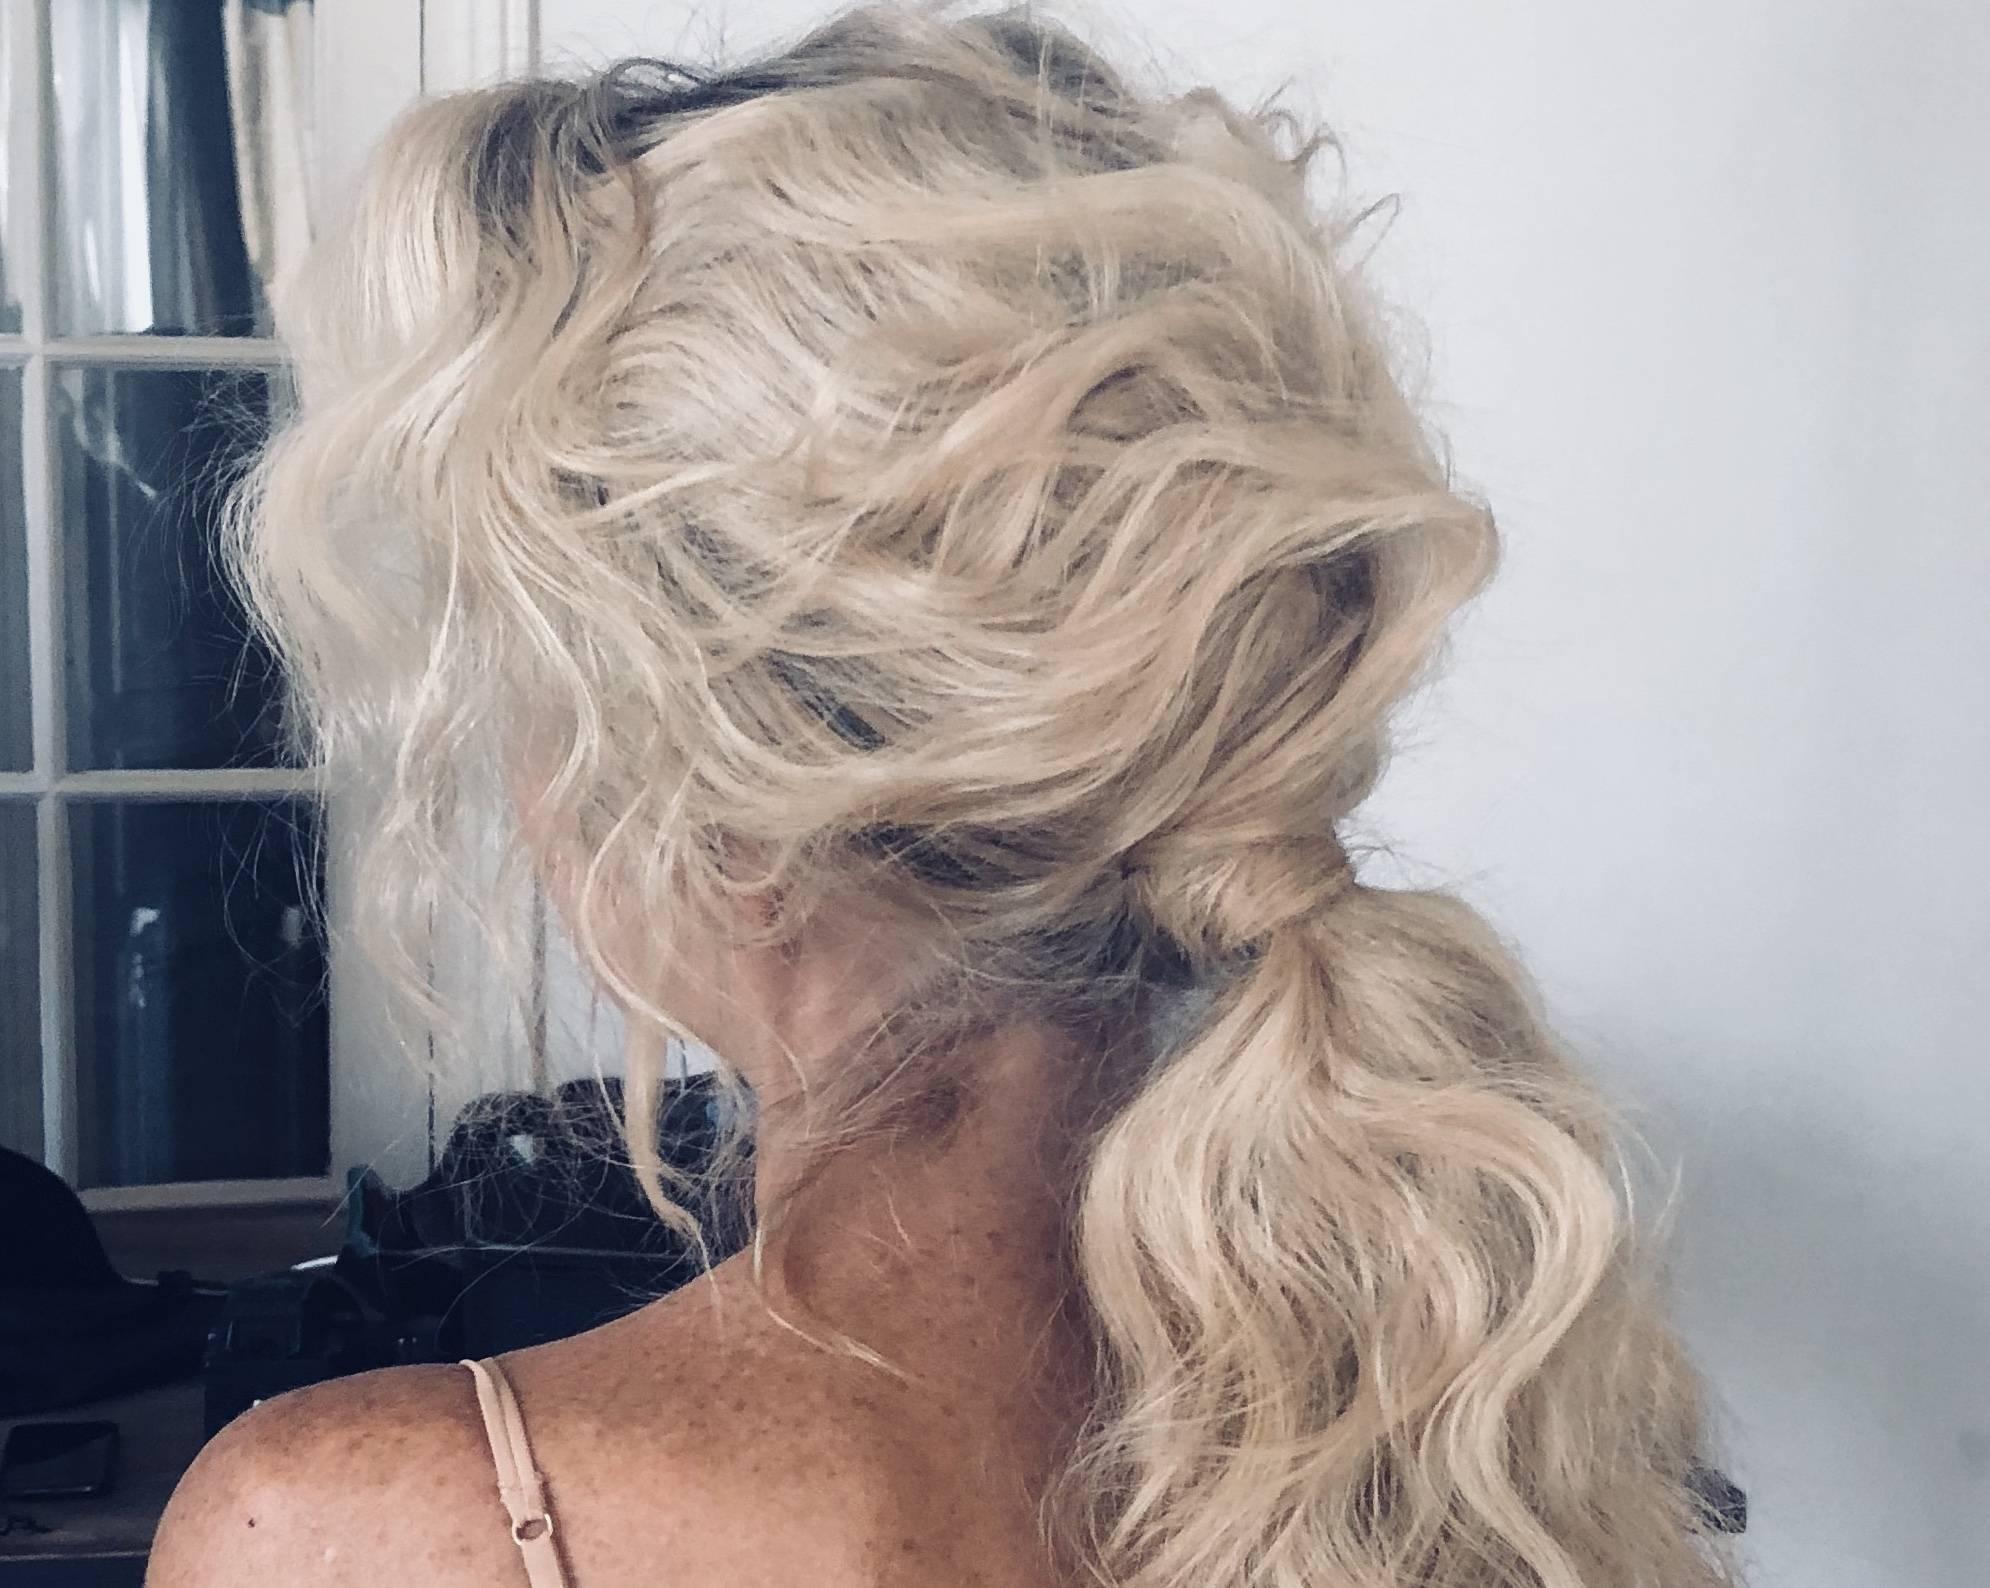 Blonde ponytail Davines how to